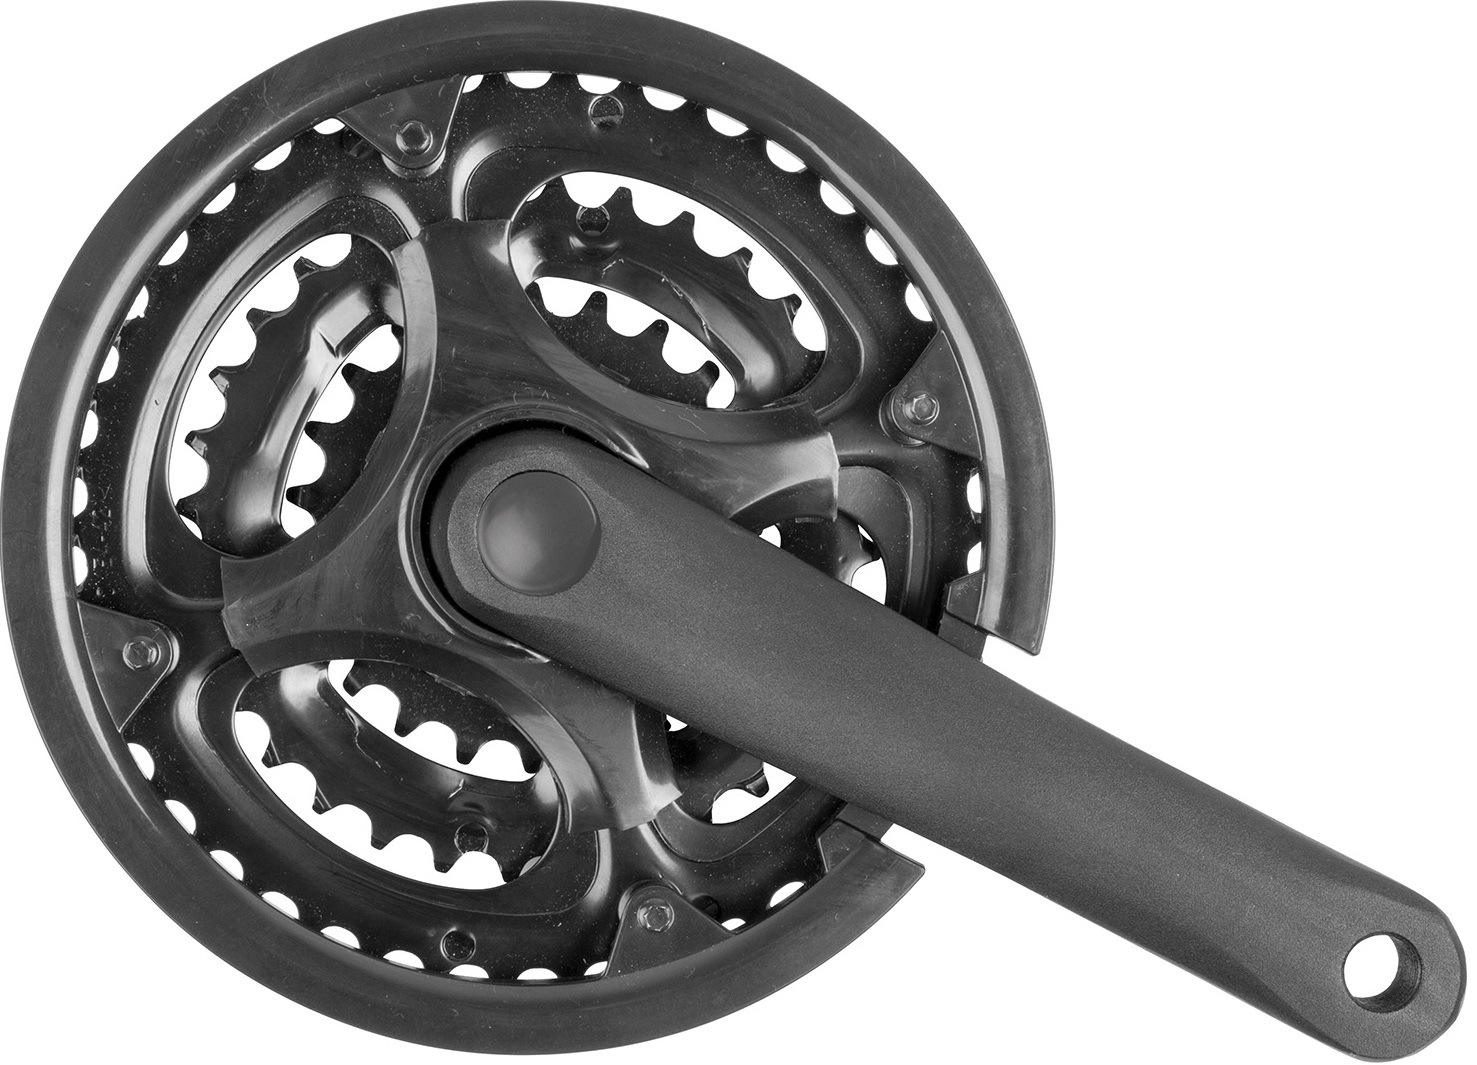 gonilke m-wave mtb set triple aloy 170mm 22/32/42t black